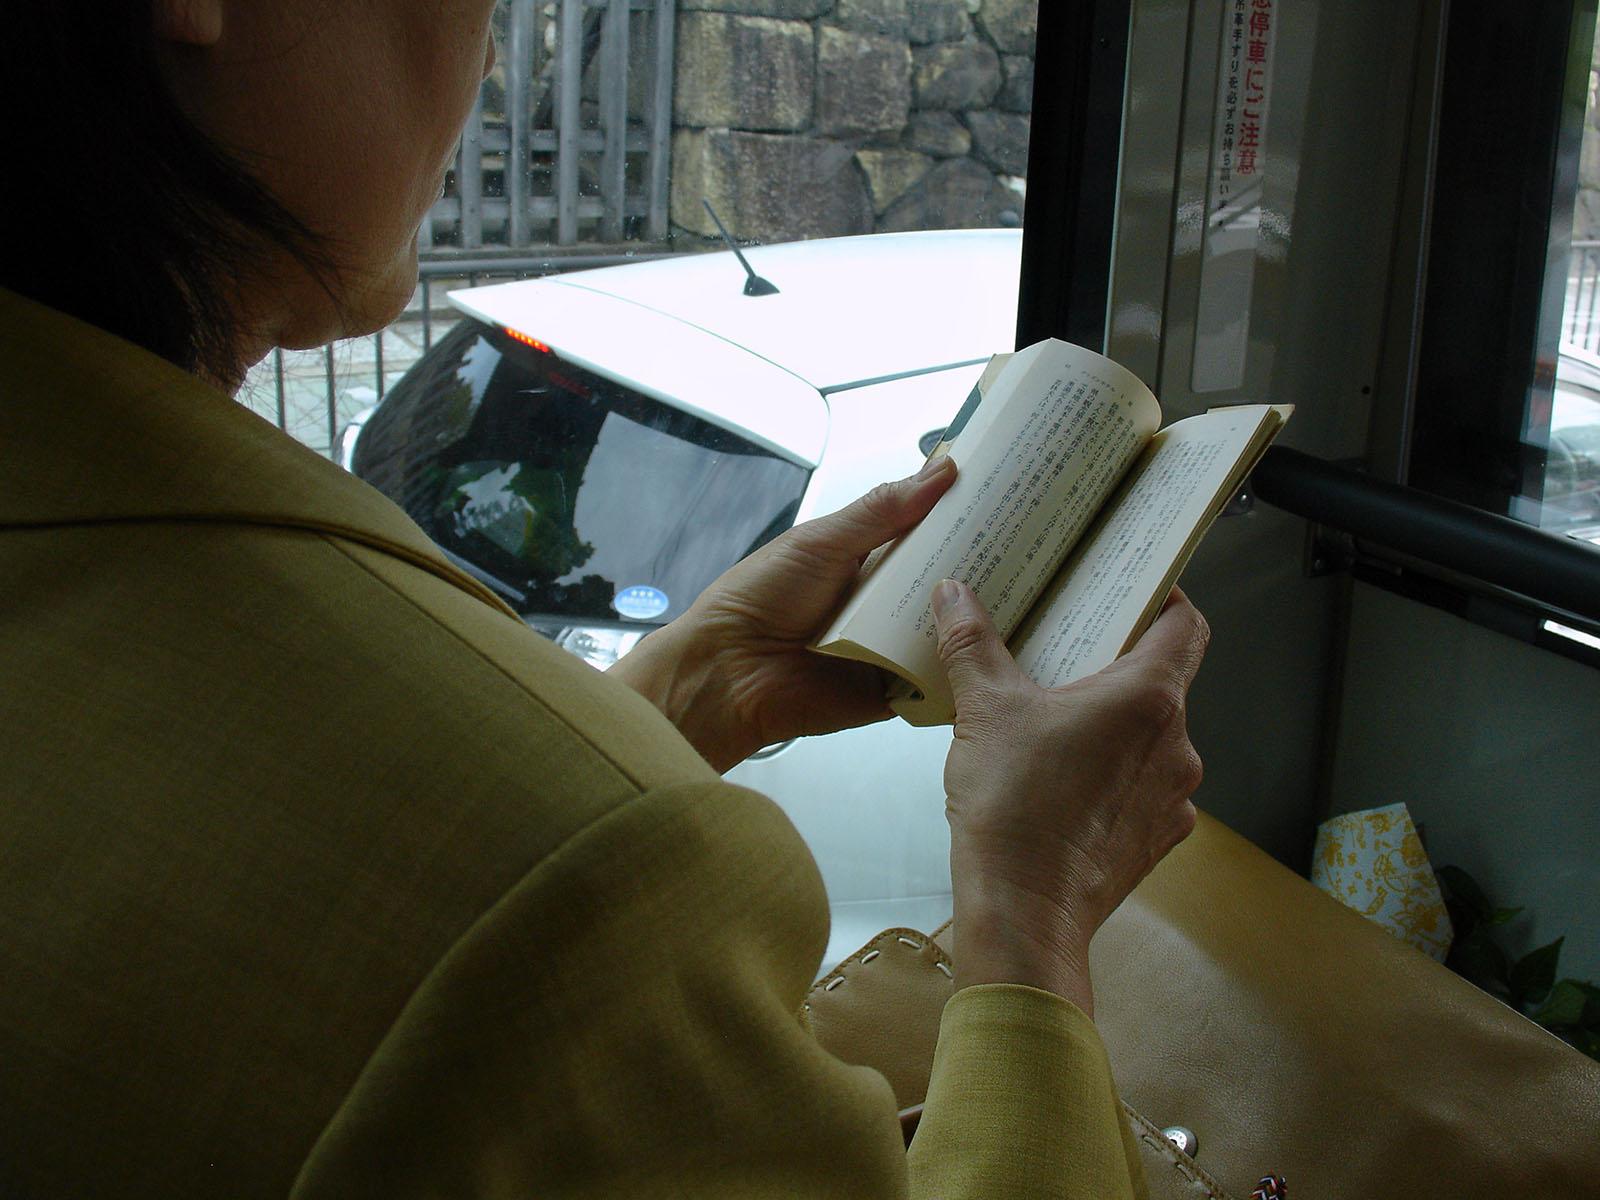 kyoto bus livre 2008